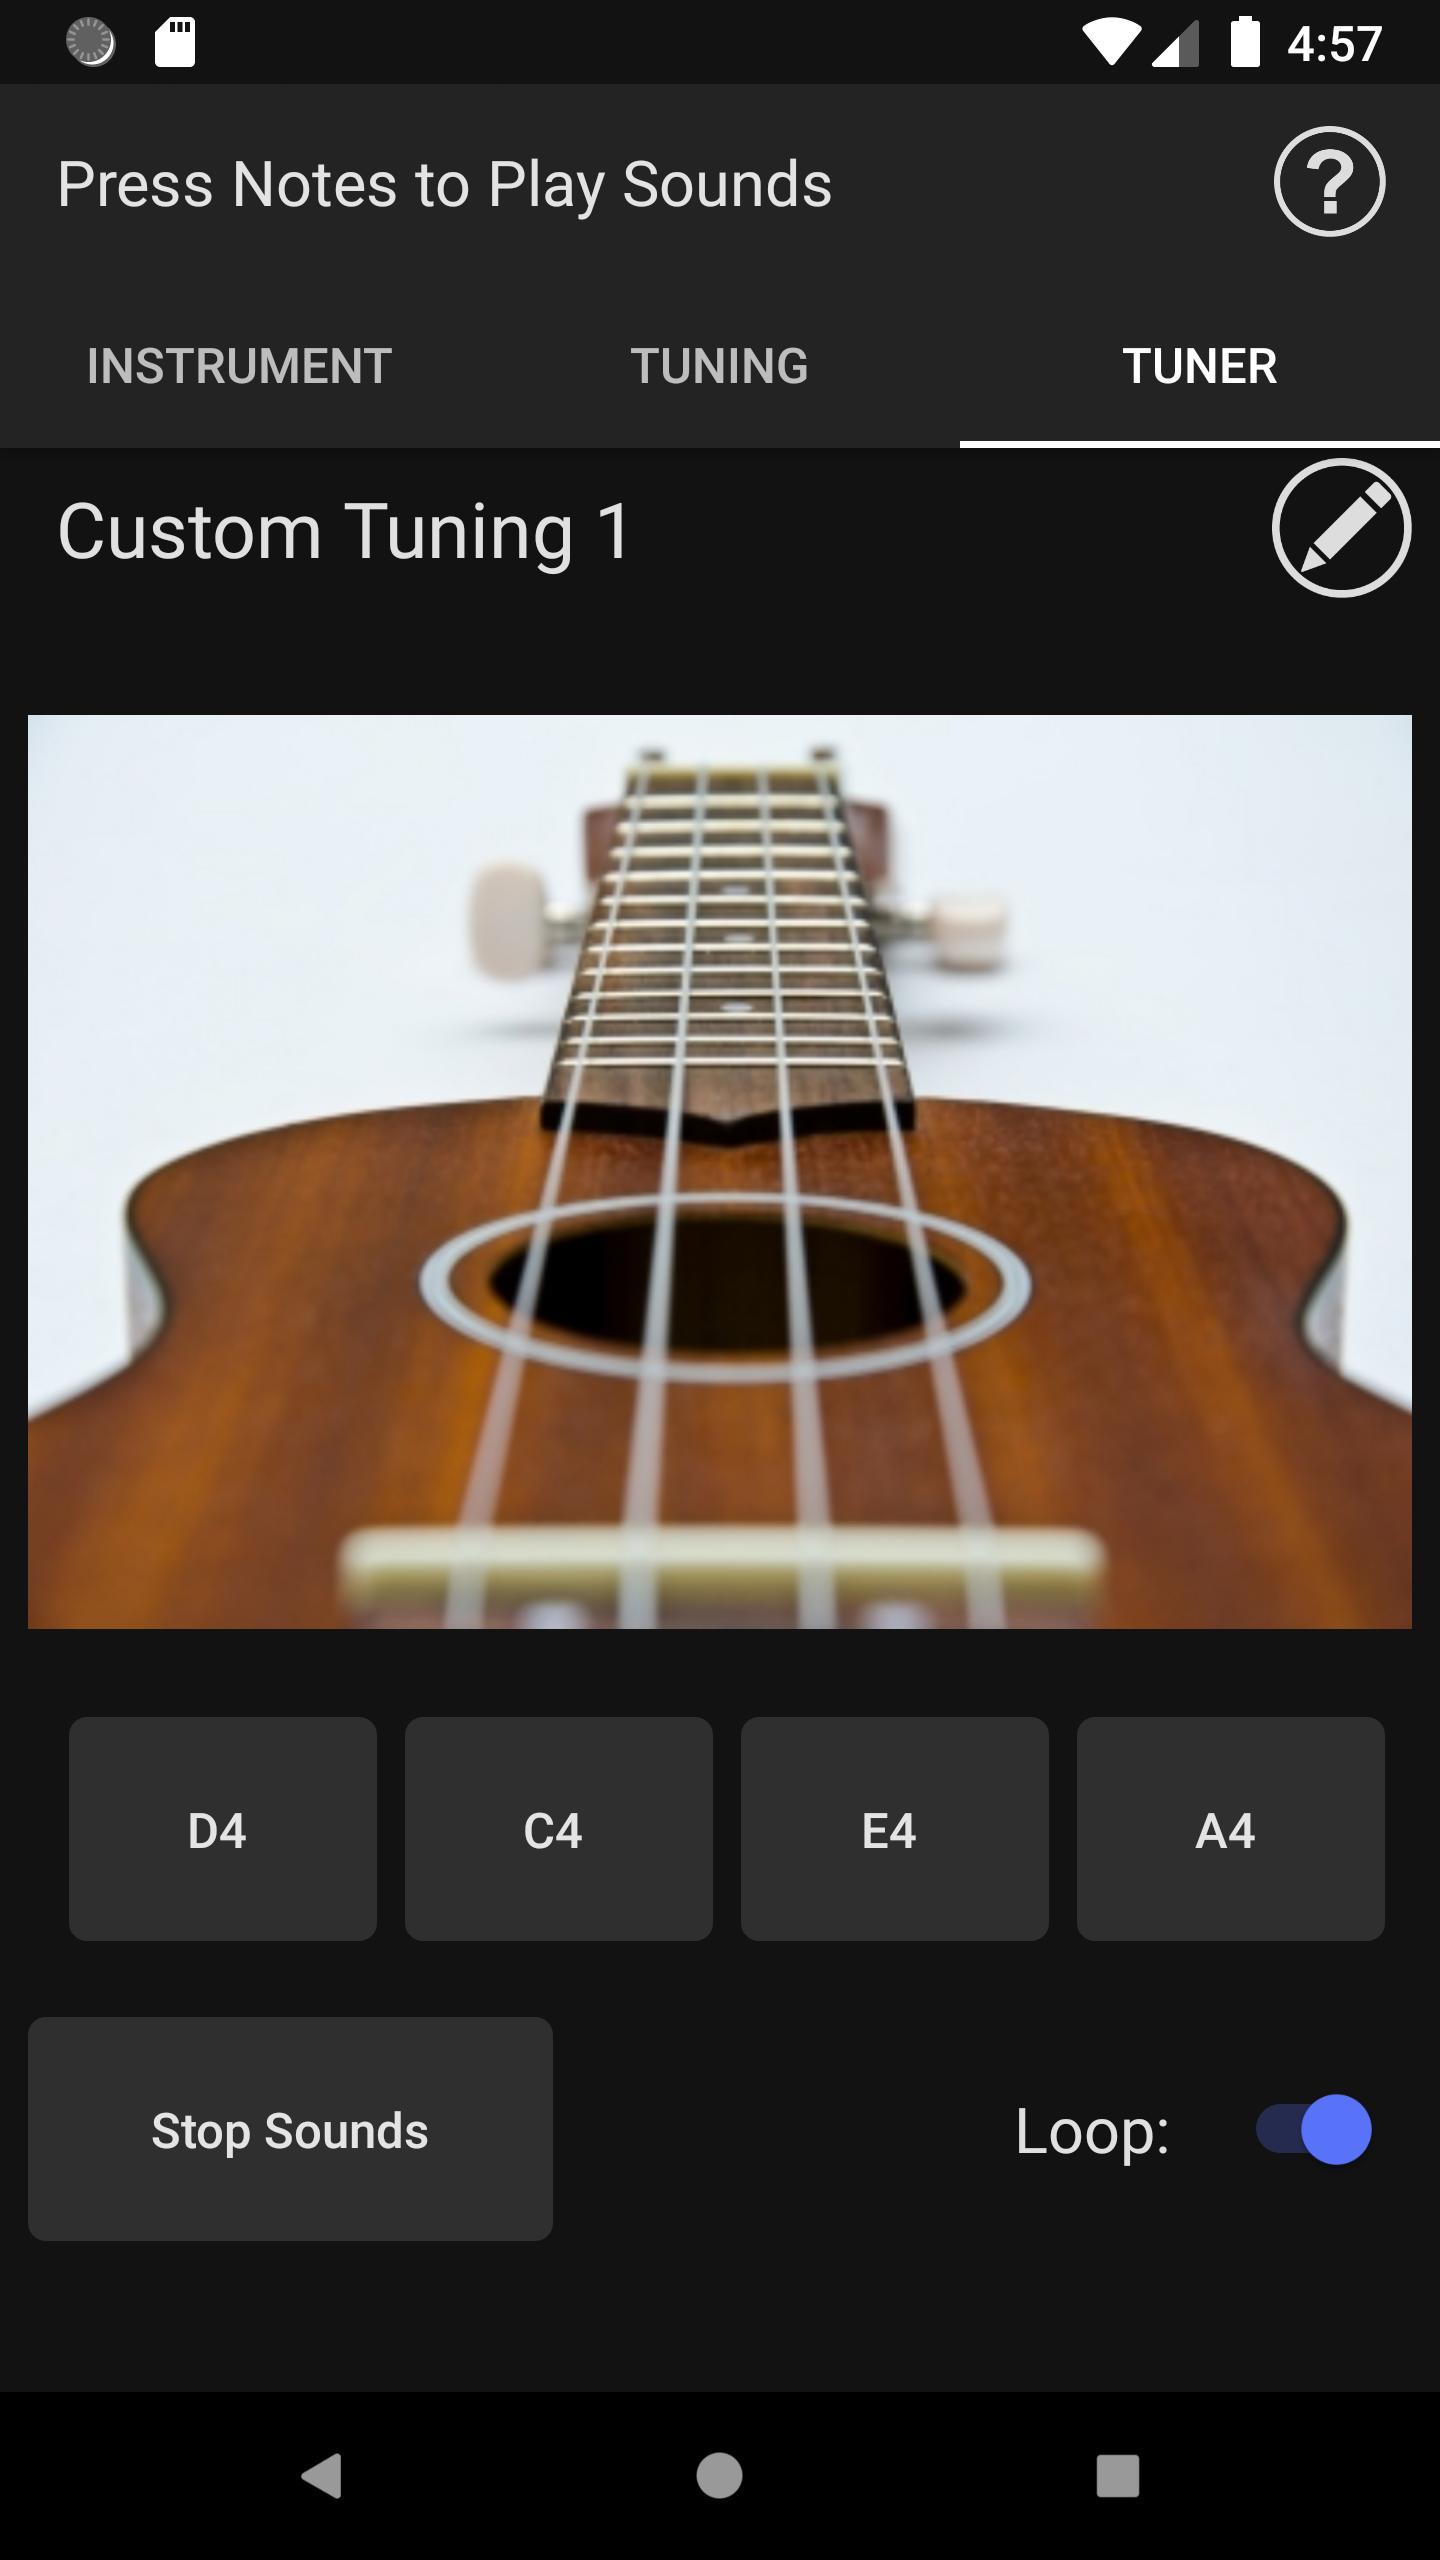 Chrome Ukulele Roblox Music Toolkit Free Ukulele Tuner For Android Apk Download